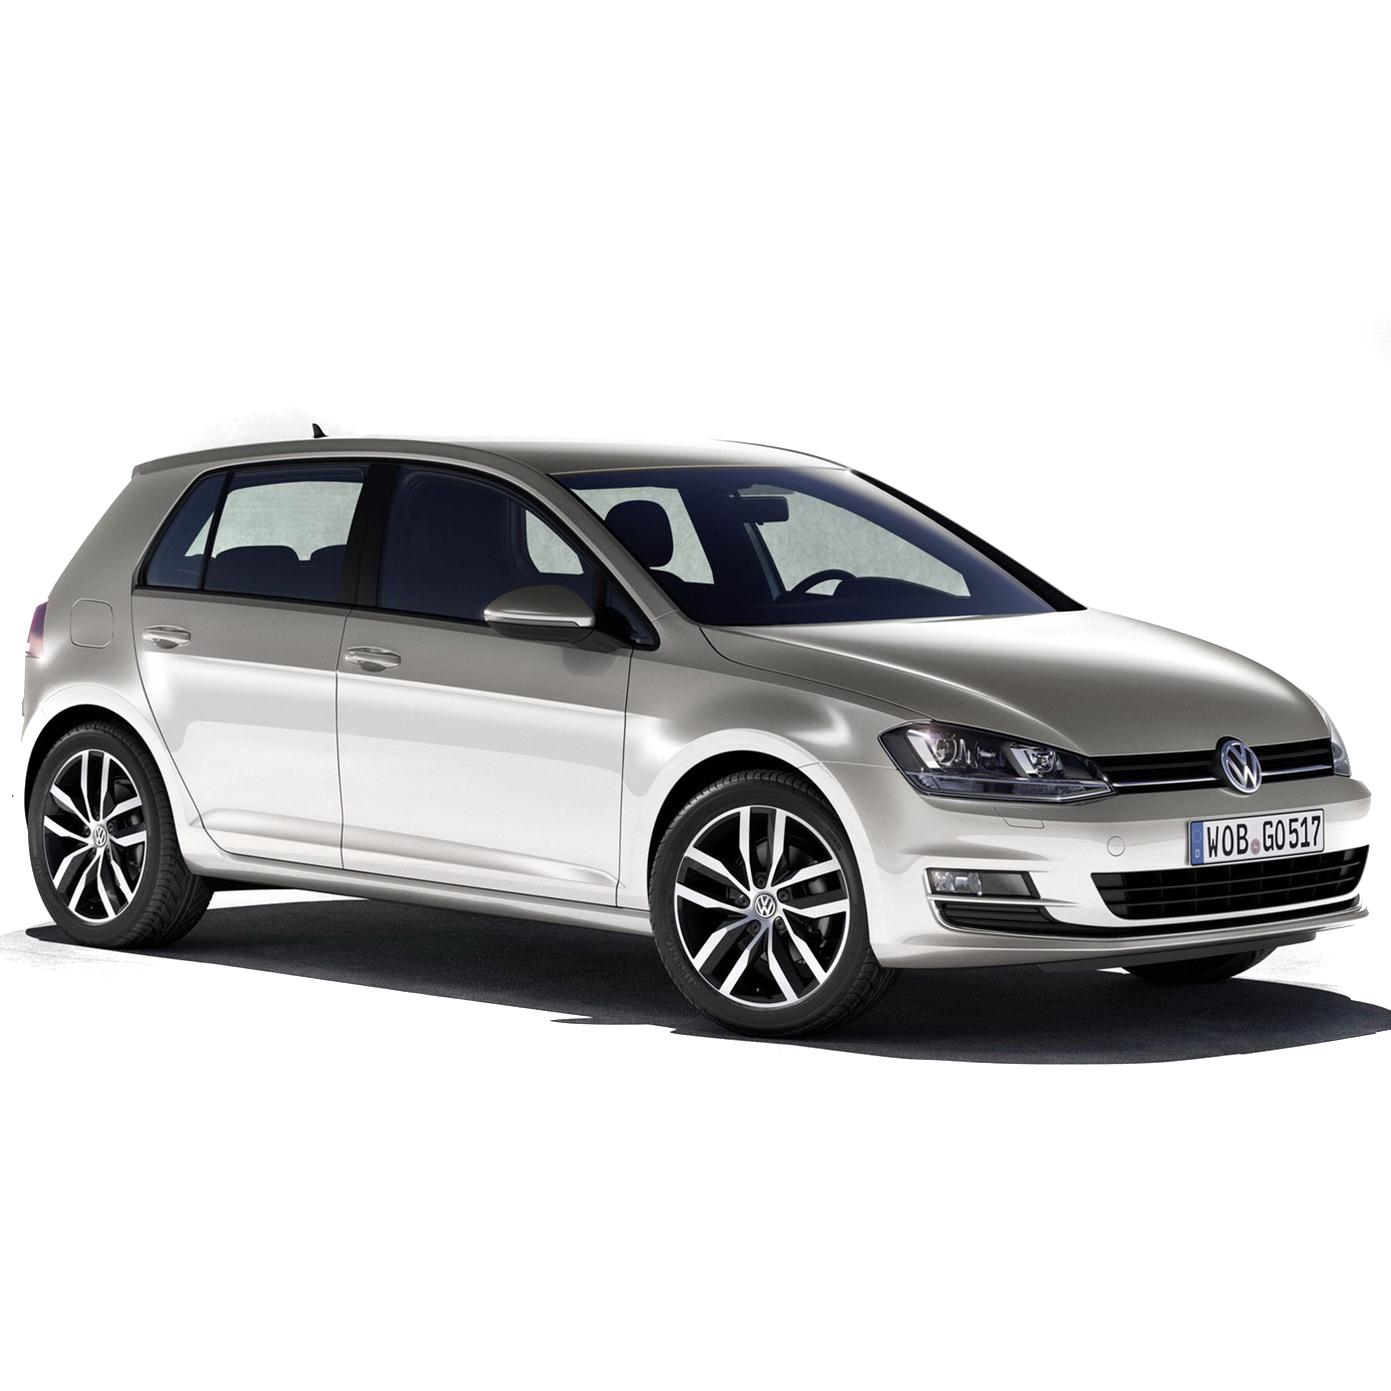 VW Golf Mk6 2009-2013